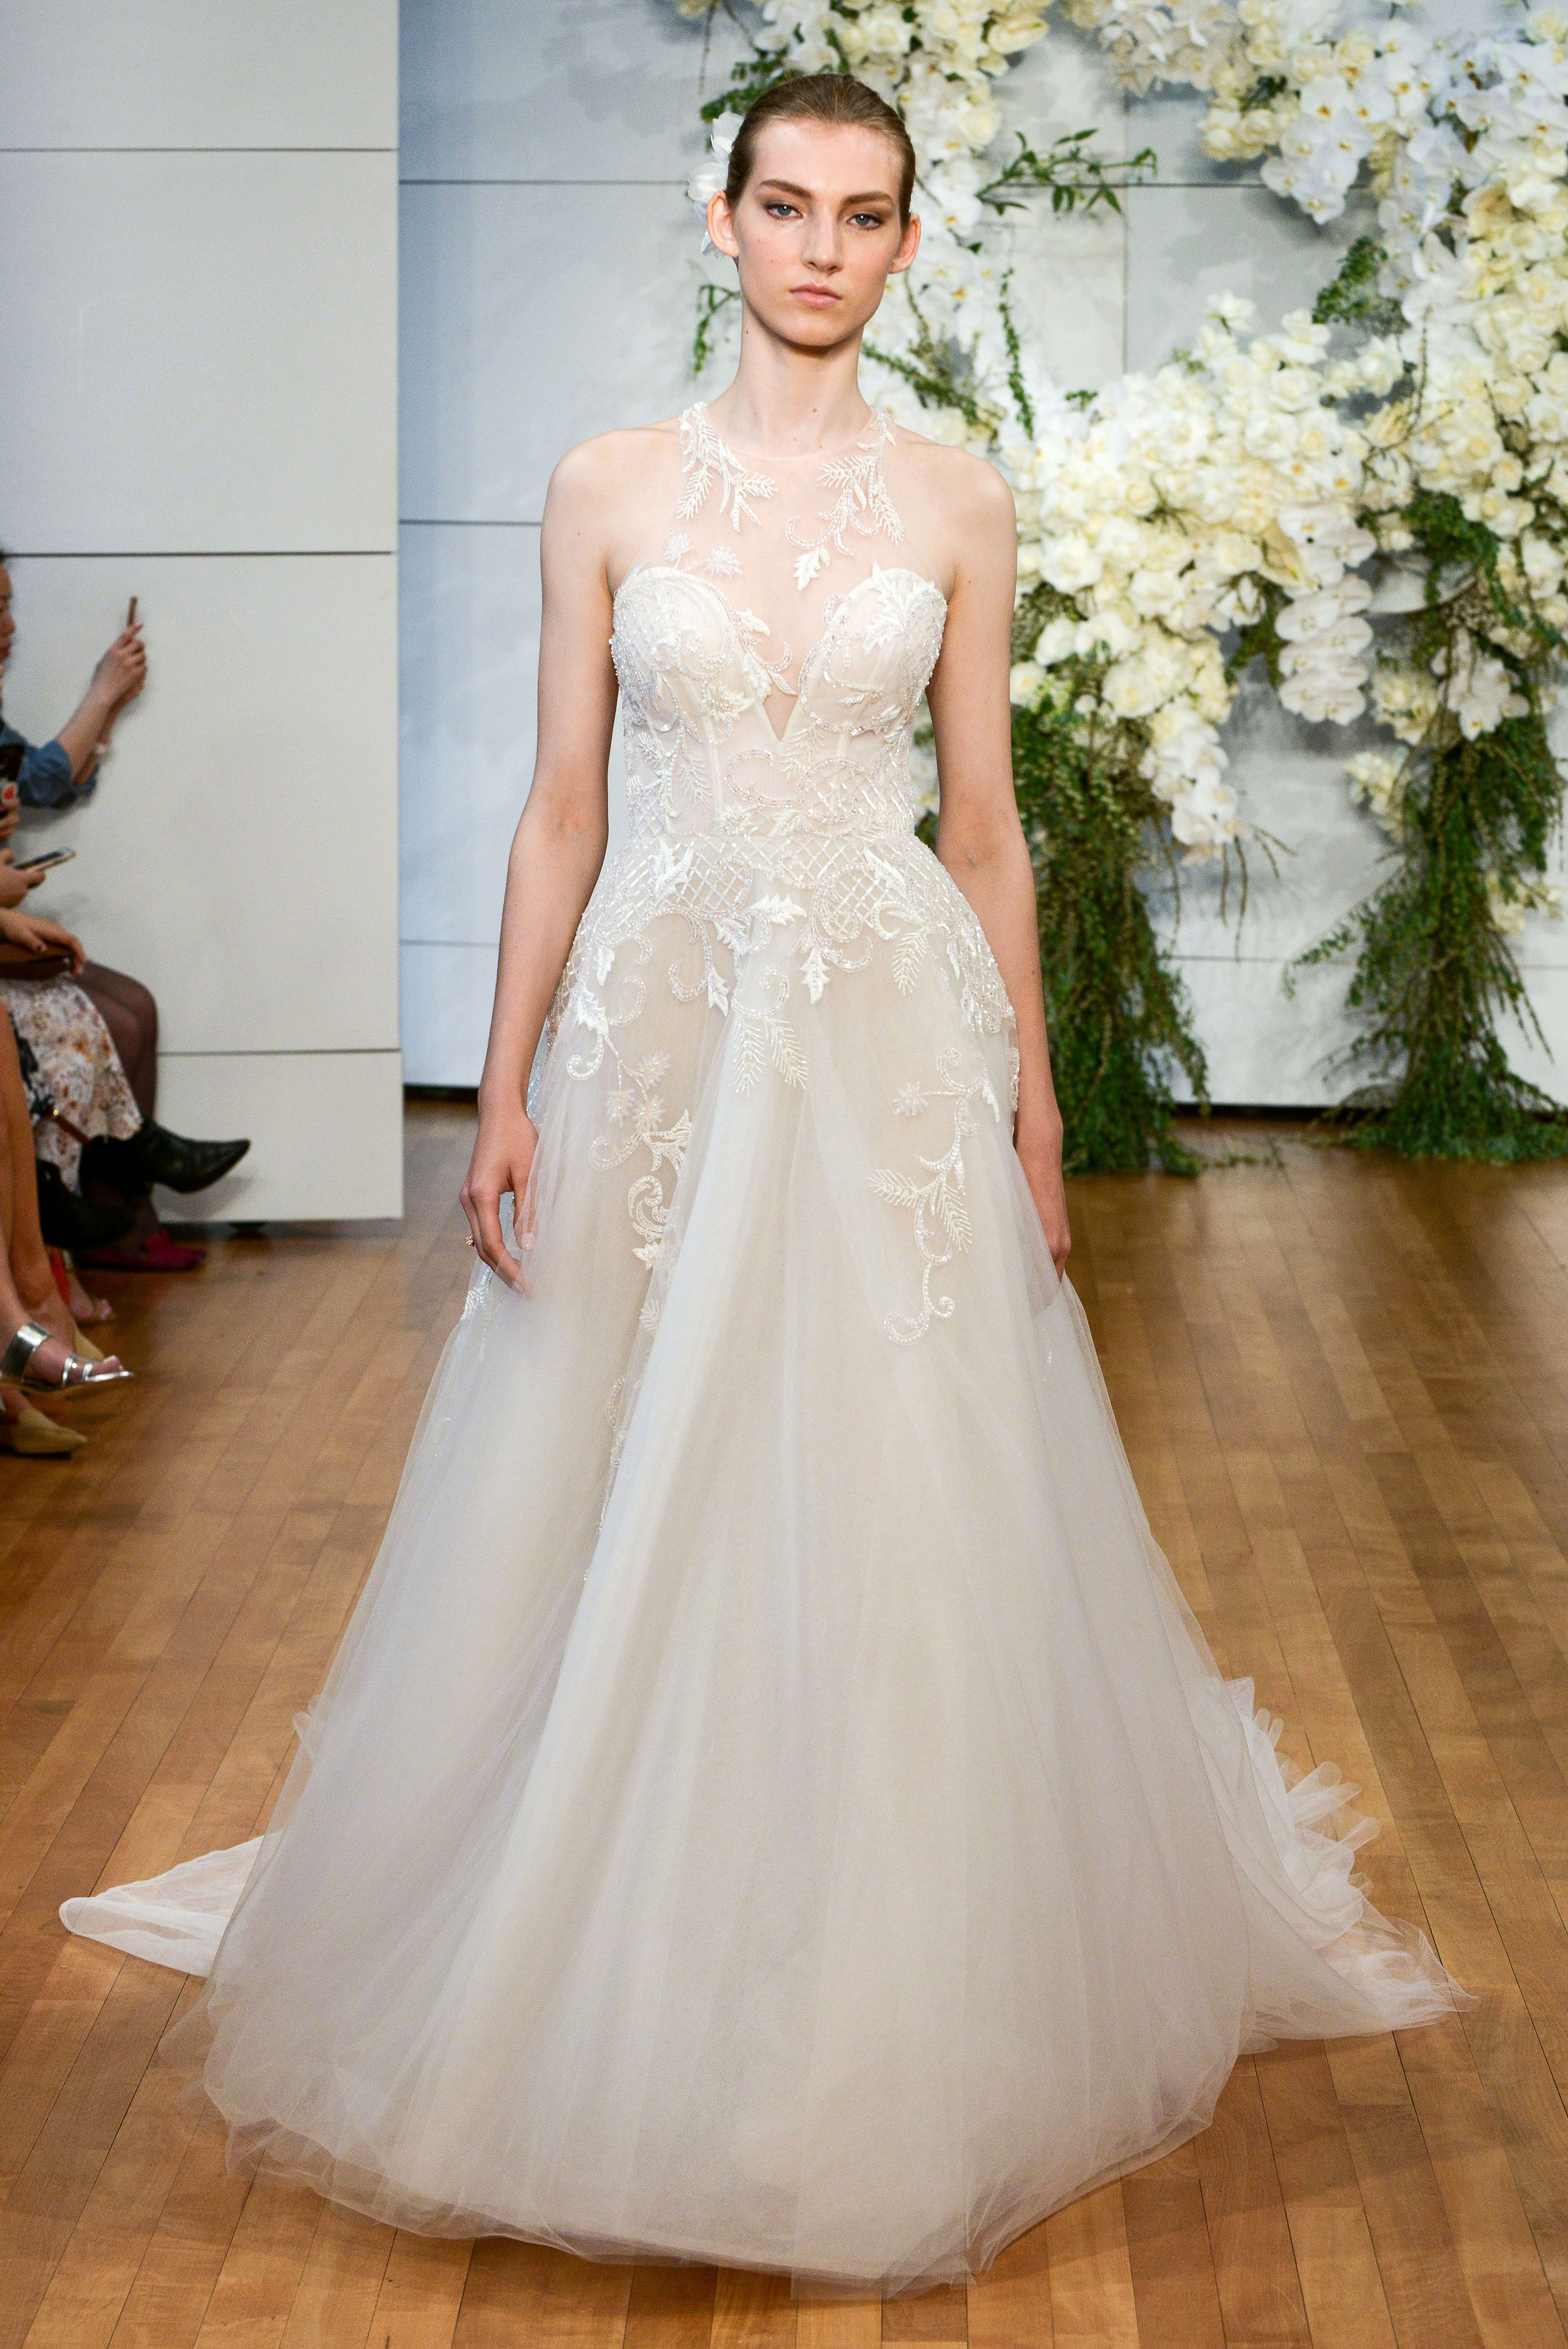 monique lhuillier illusion tulle a-line wedding dress spring 2018